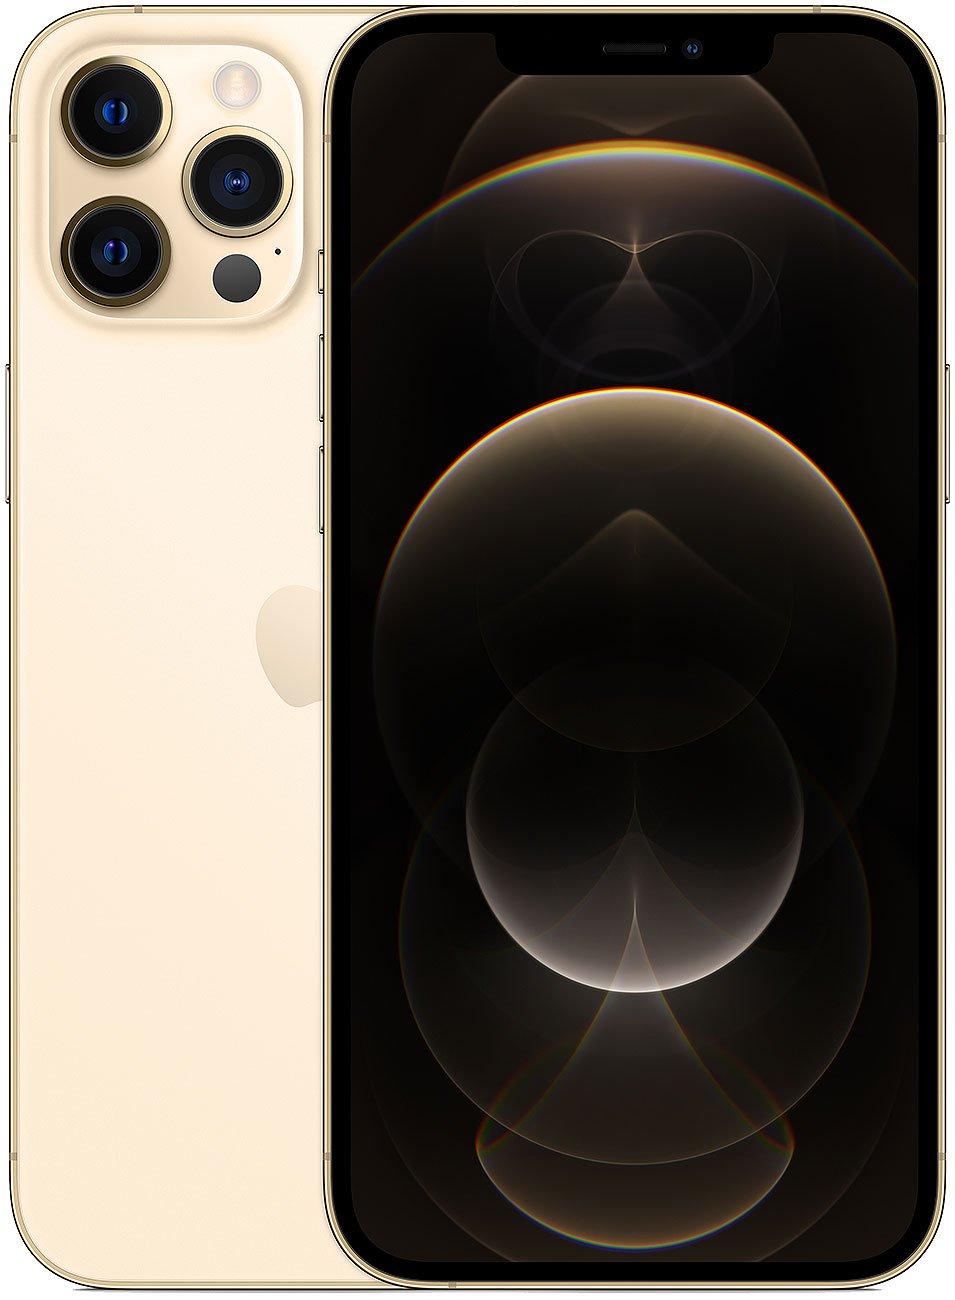 Apple 256GB iPhone 12 Pro Max Cellular Phone